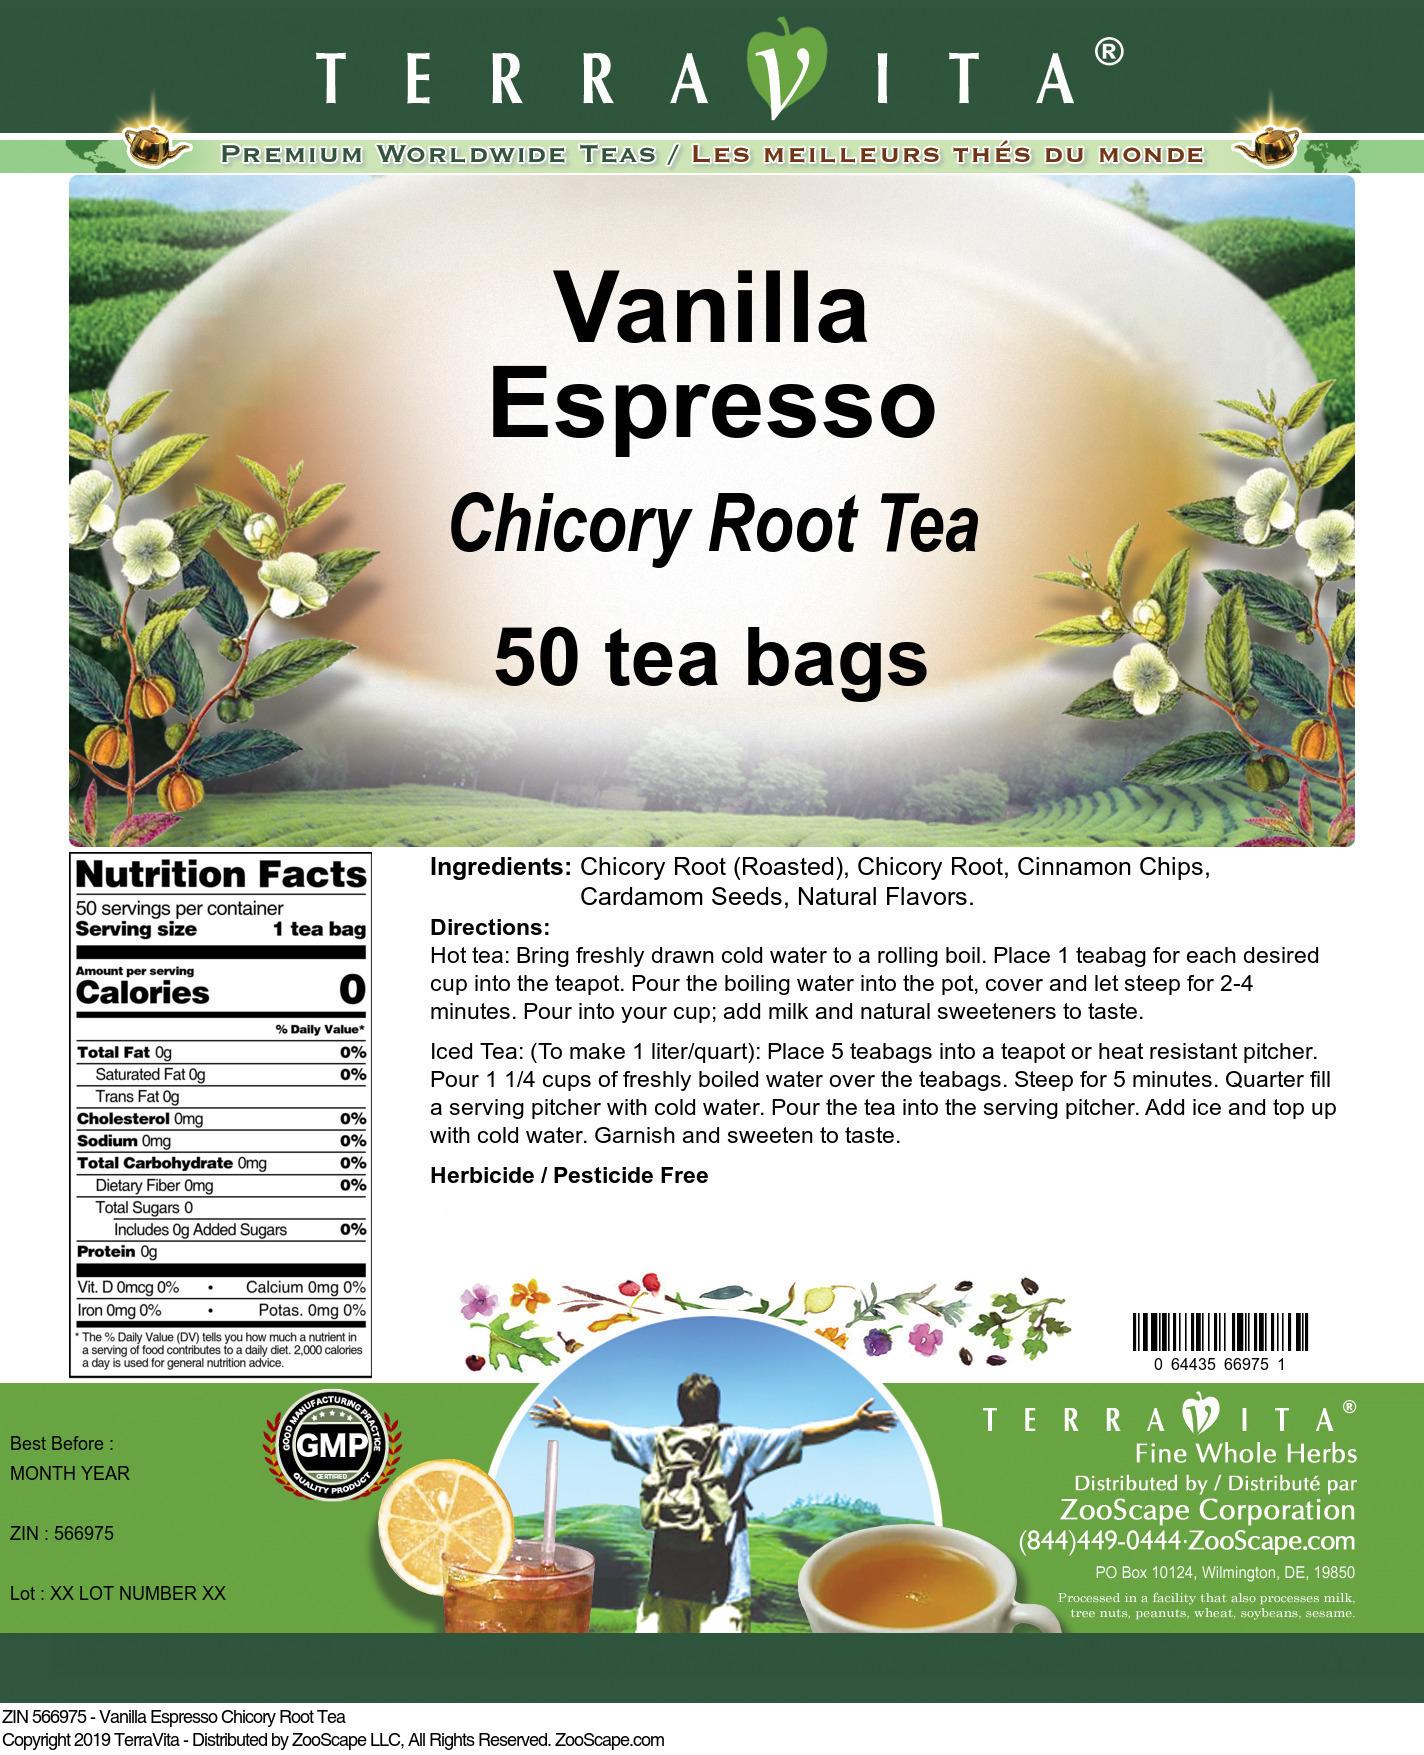 Vanilla Espresso Chicory Root Tea